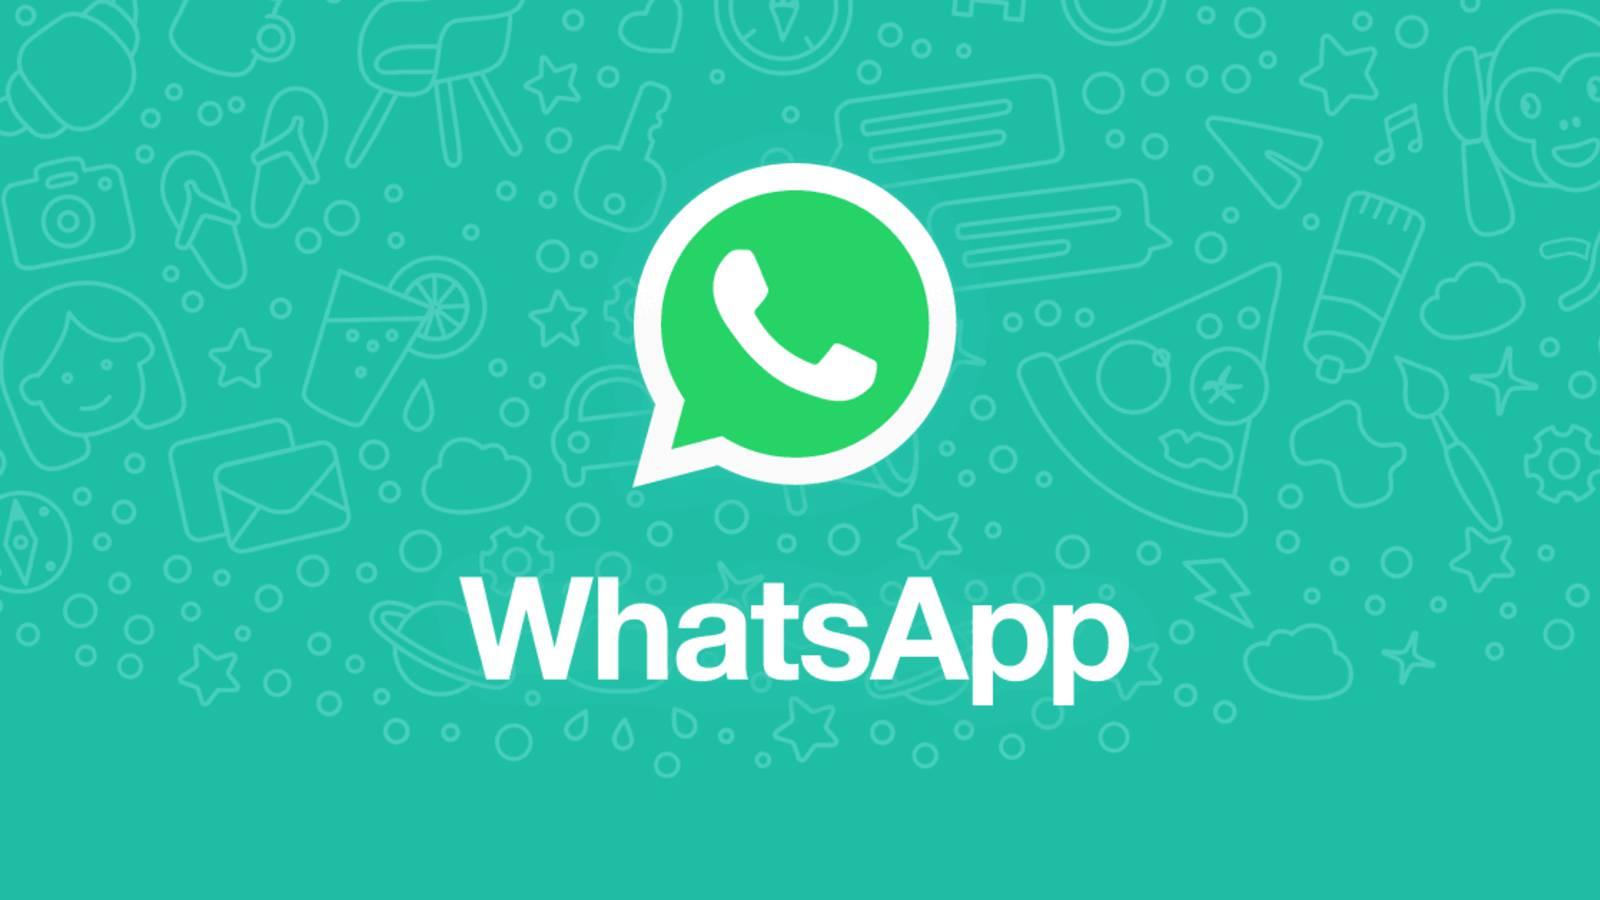 WhatsApp sunet